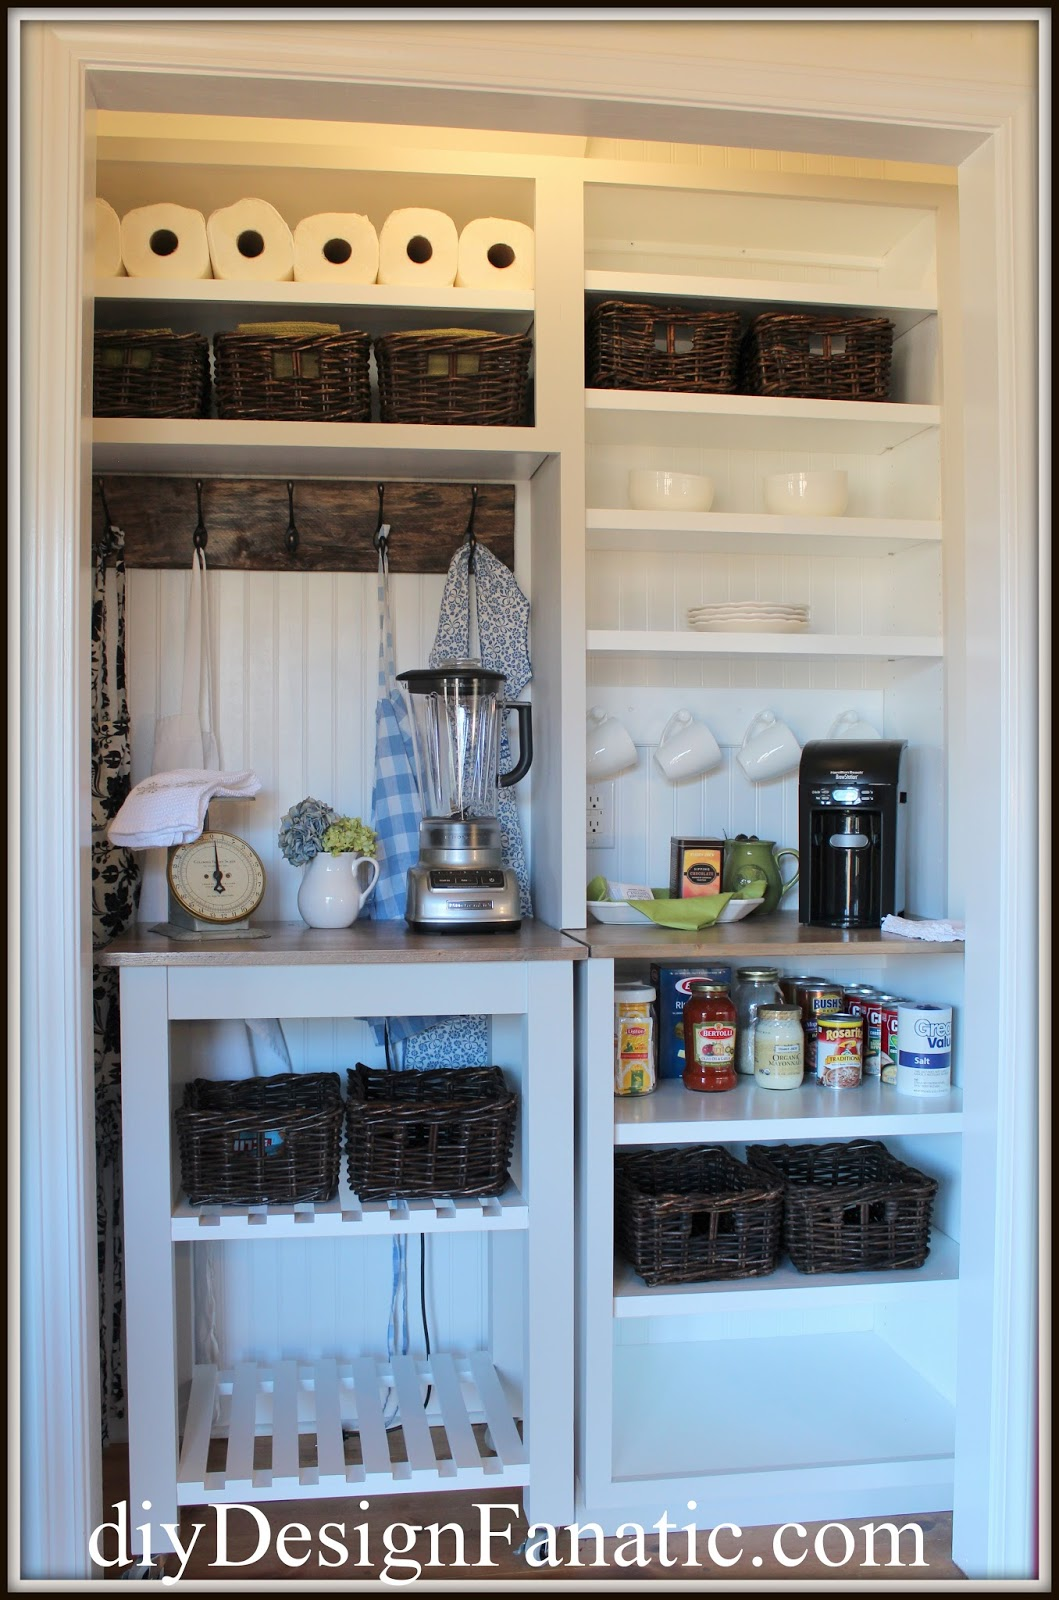 cottage, cottage style, cottage kitchen, kitchen reno, farmhouse, farmhouse style, farmhouse kitchen, Vintage Style Pantry, kitchen cart, reclaimed wood, coat rack, pantry storage, diyDesignFanatic.com